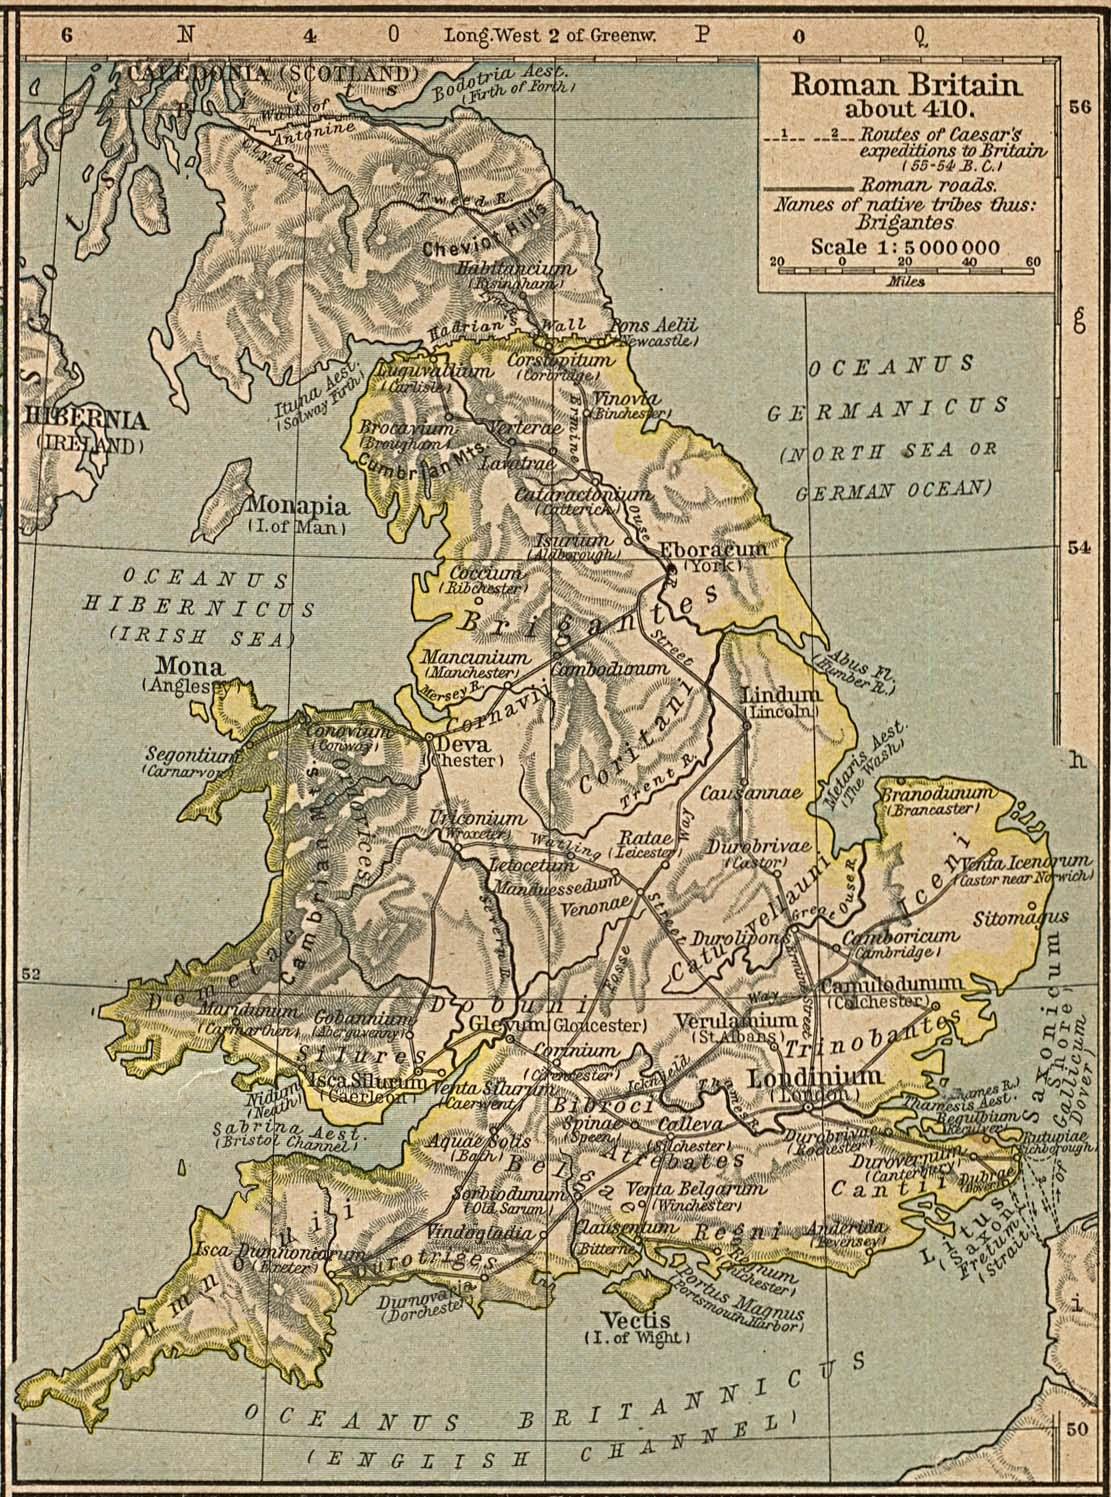 Mapa de Britania (Provincia Romana) Circa 410